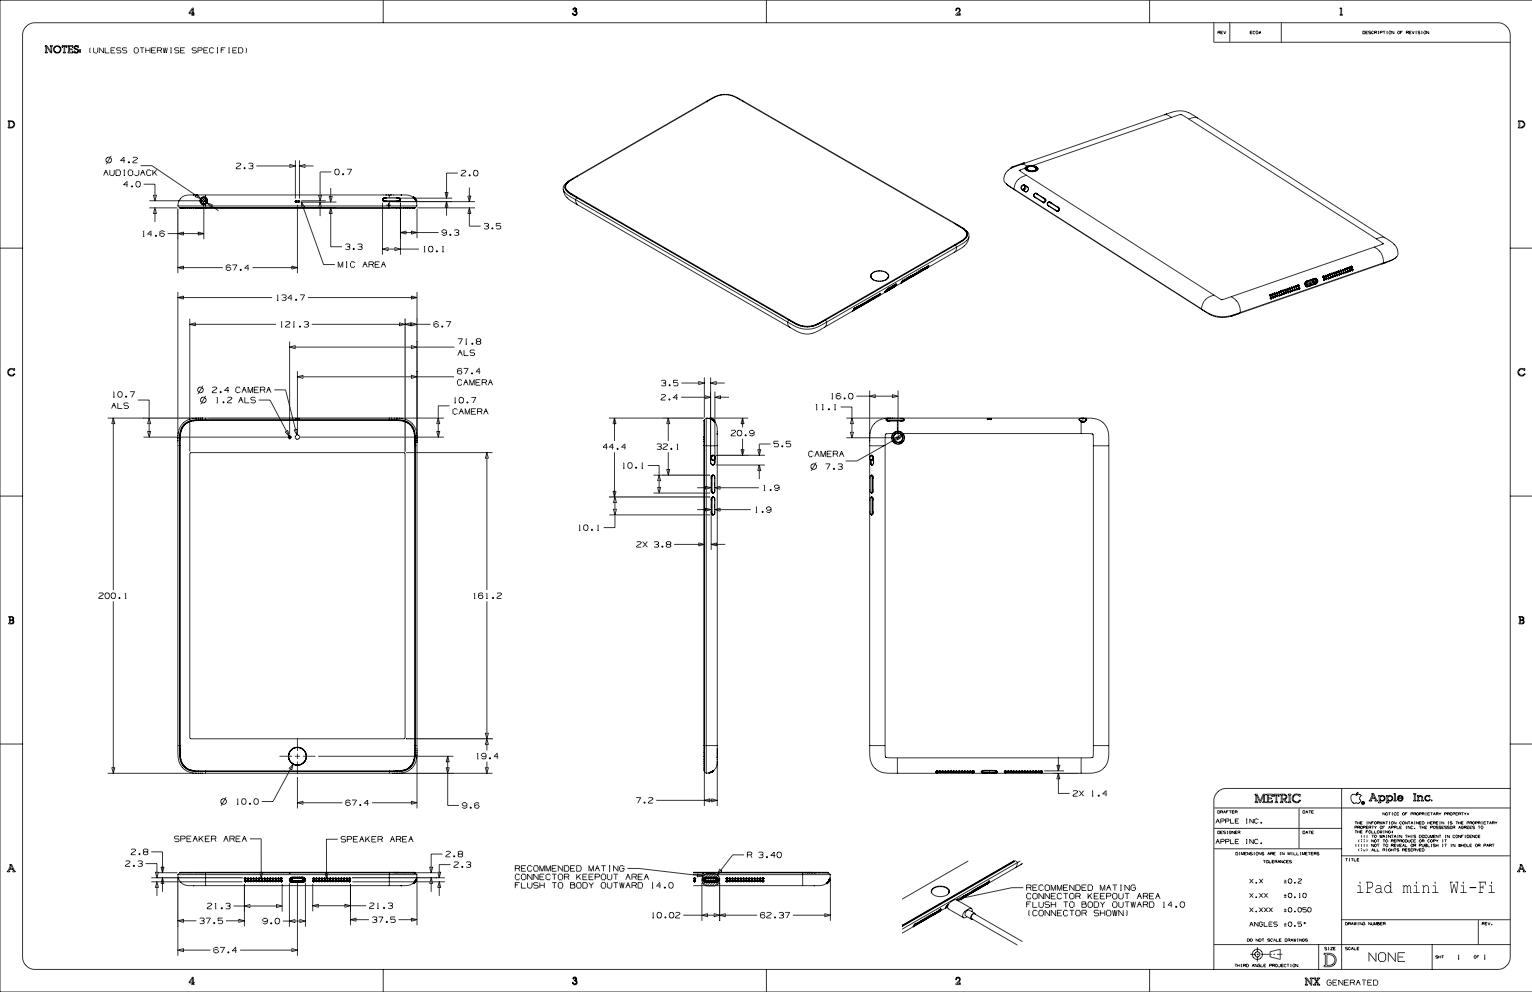 ipad 3 circuit diagram wiring diagram rh asd rundumhund aktiv de  ipad mini 3 schematic diagram